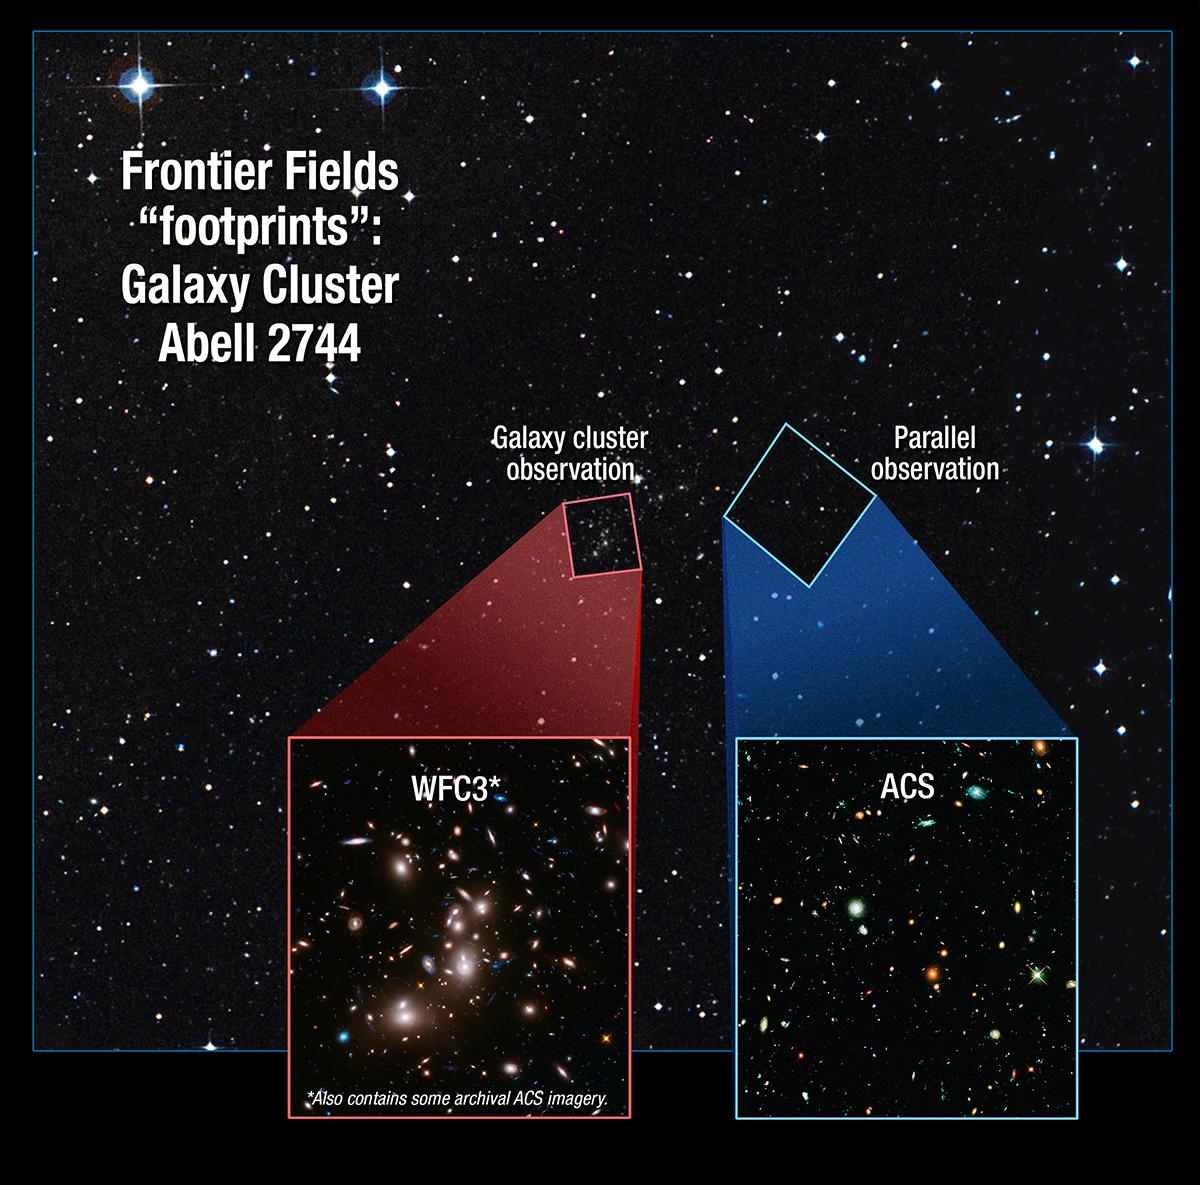 Frontier Fields Footprint: Galaxy Cluster Abell 2744